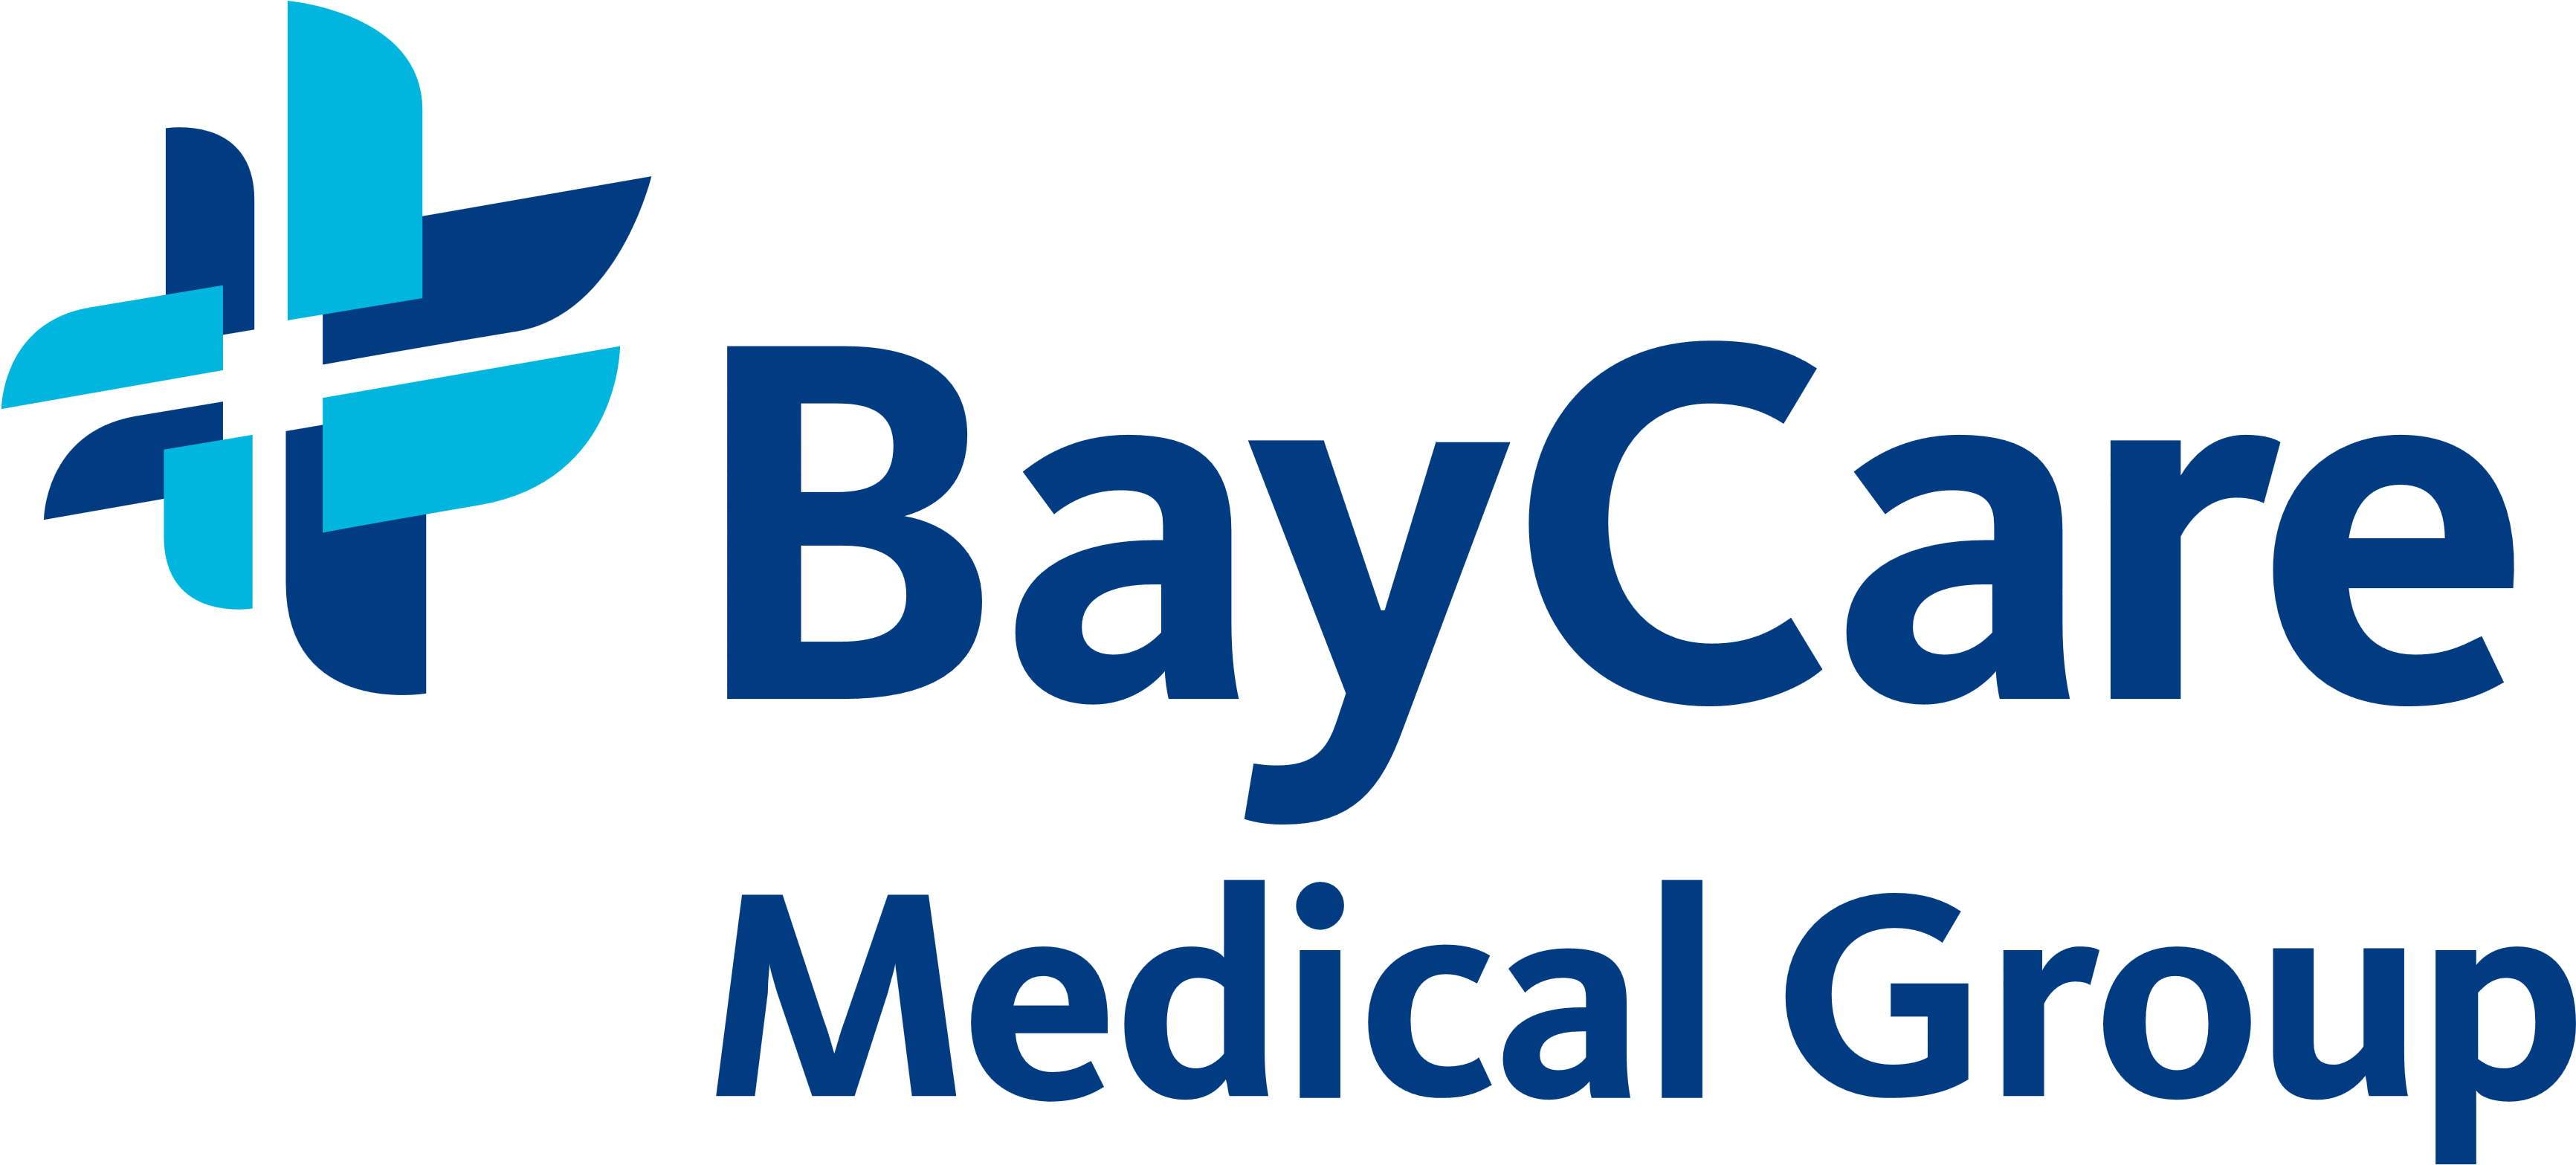 Download Astrazeneca Logo Transparent Download Baycare Medical Group Logo Png Image With No Background Pngkey Com